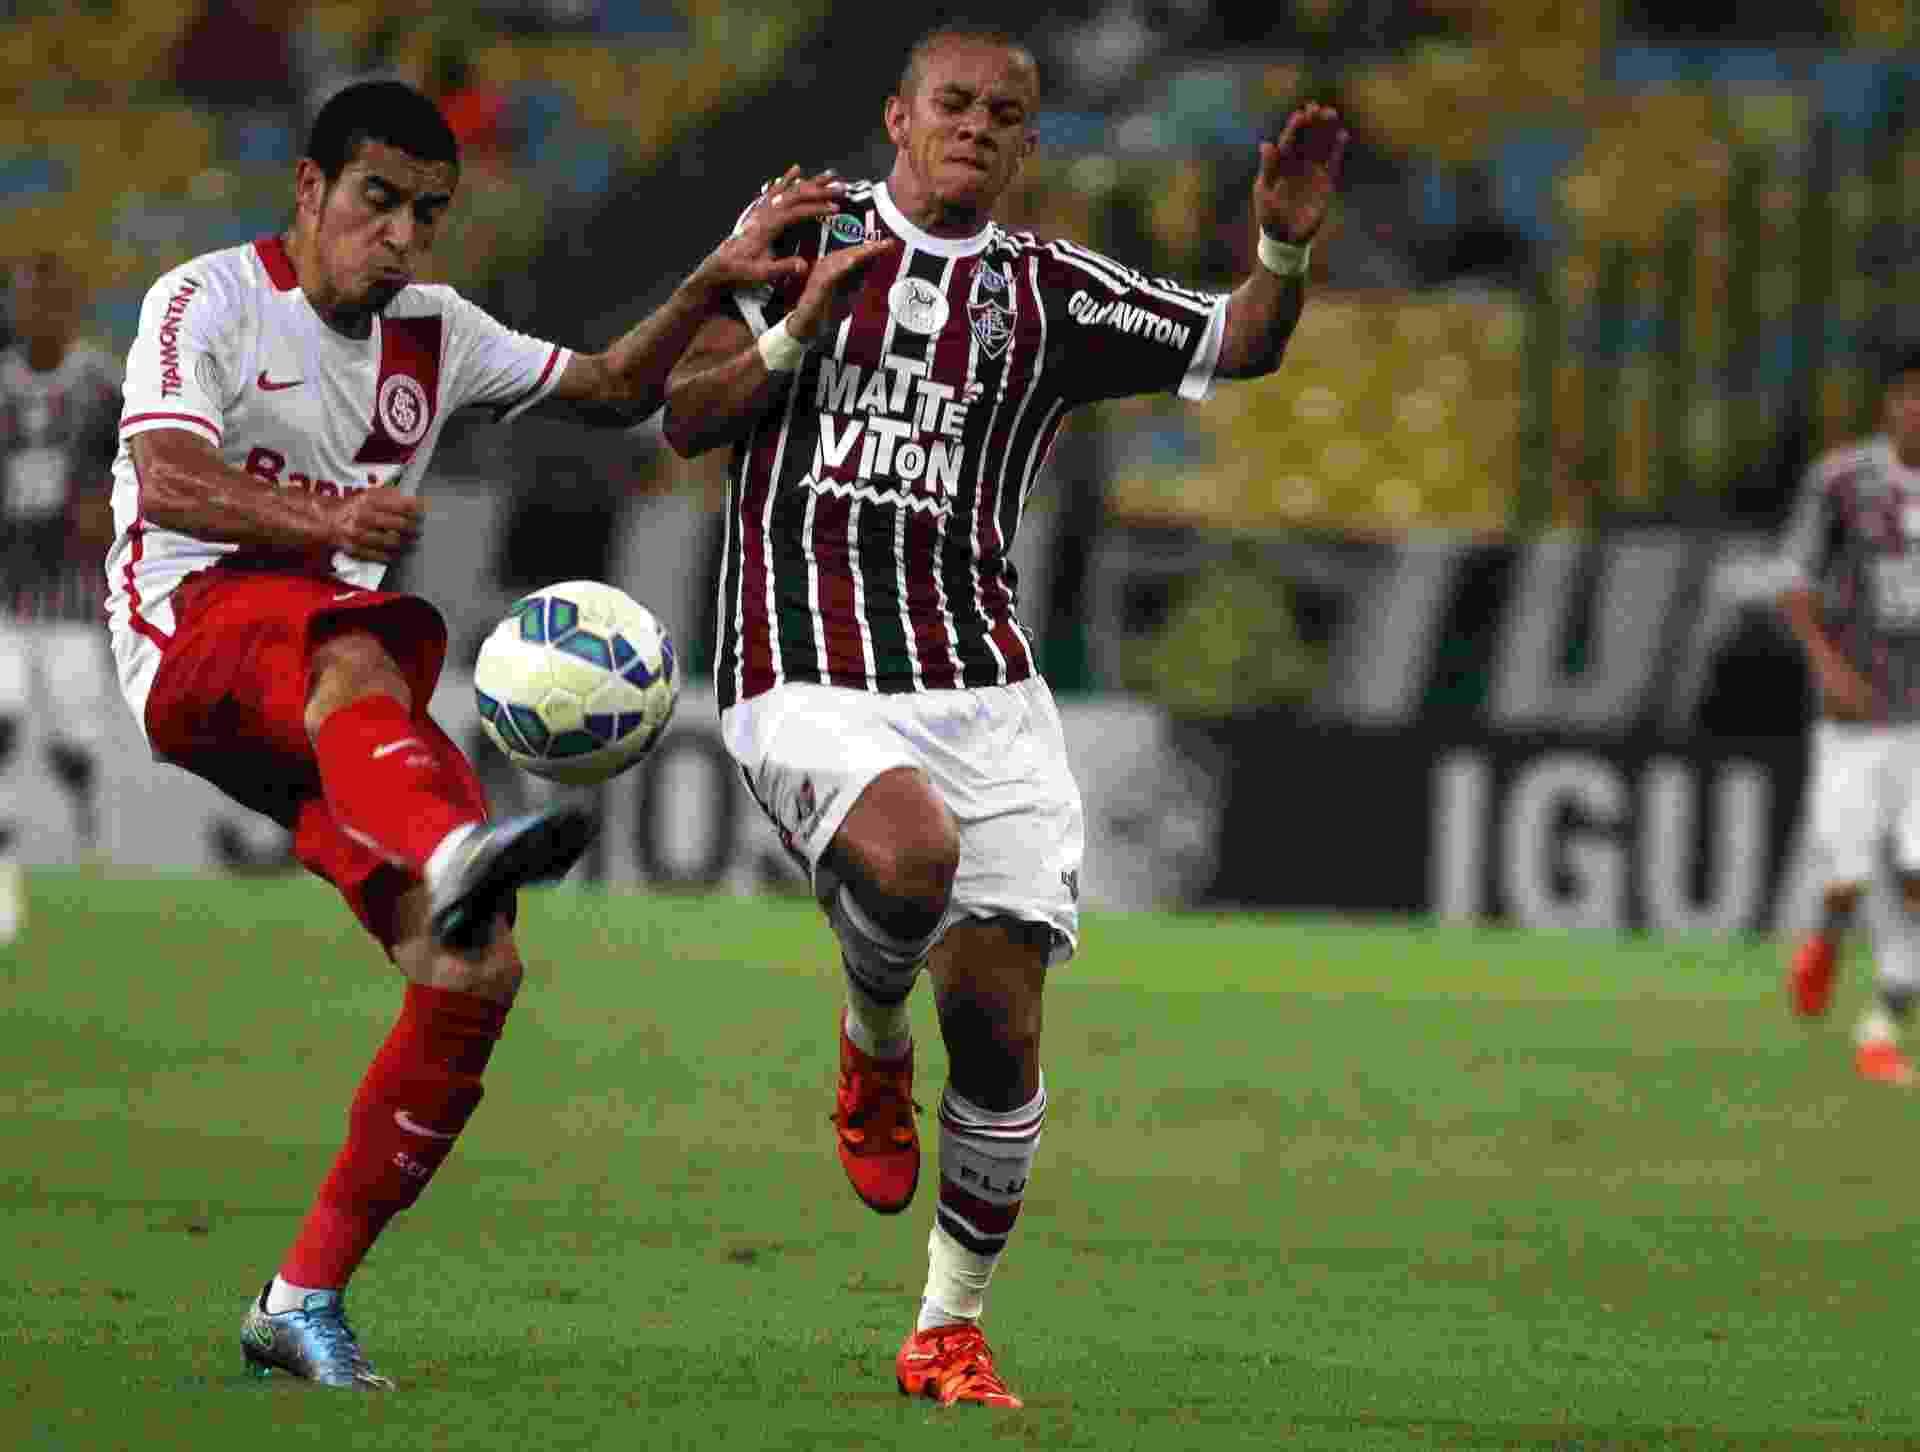 Marcos Junior disputa bola com Willian na partida entre Fluminense e Internacional - Nelson Perez/Fluminense FC